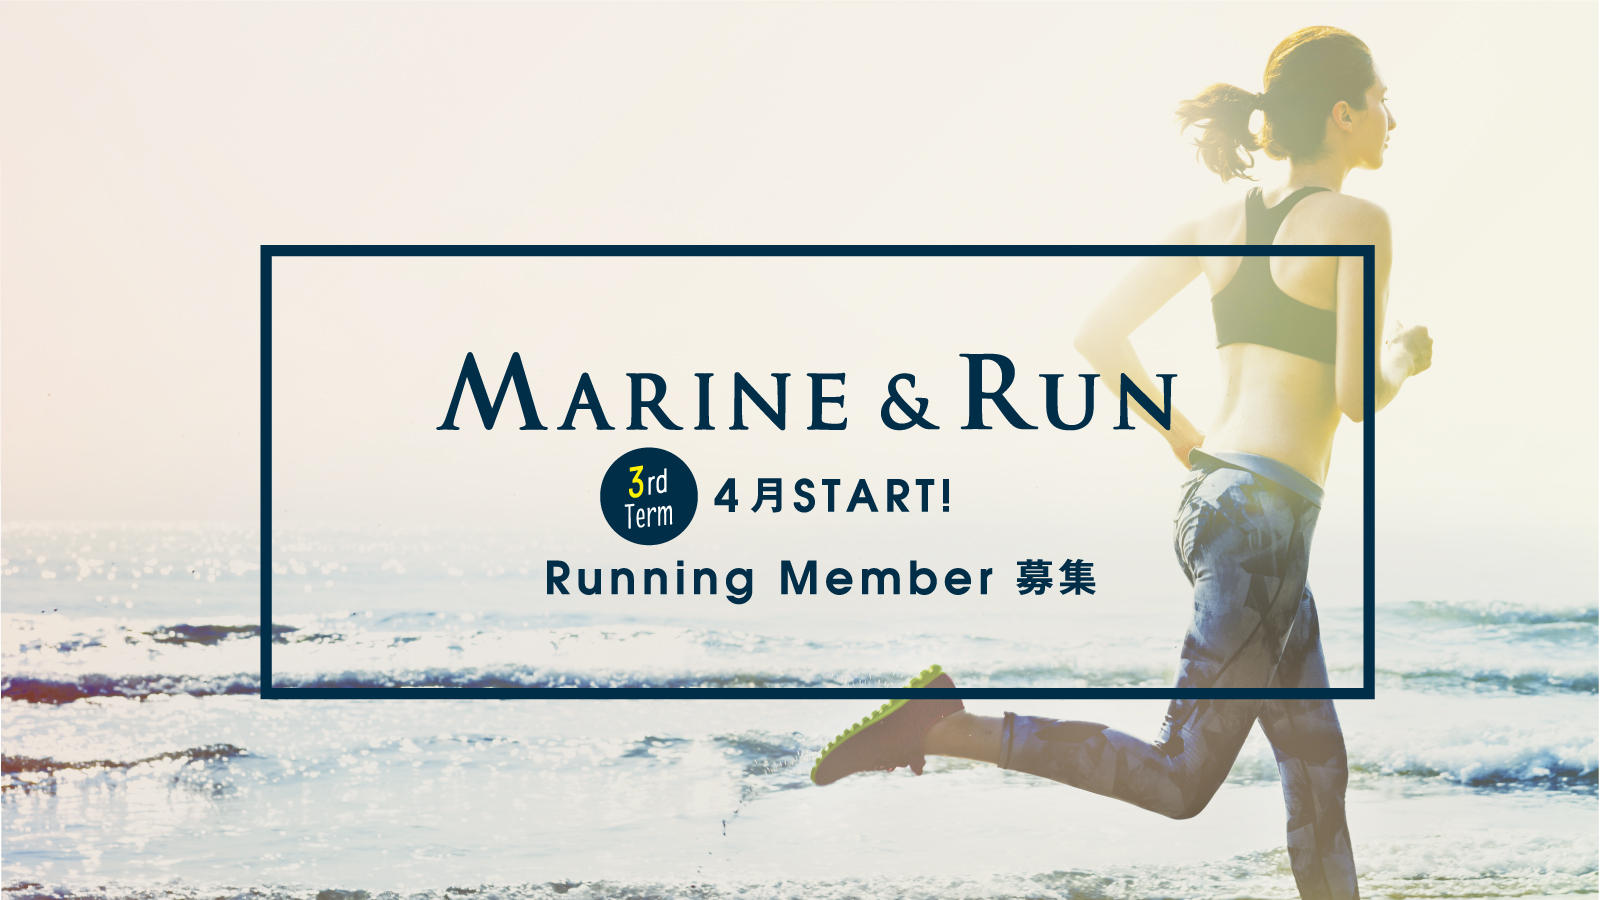 「MARINE&RUN」3rd Term第3回目 6/21開催